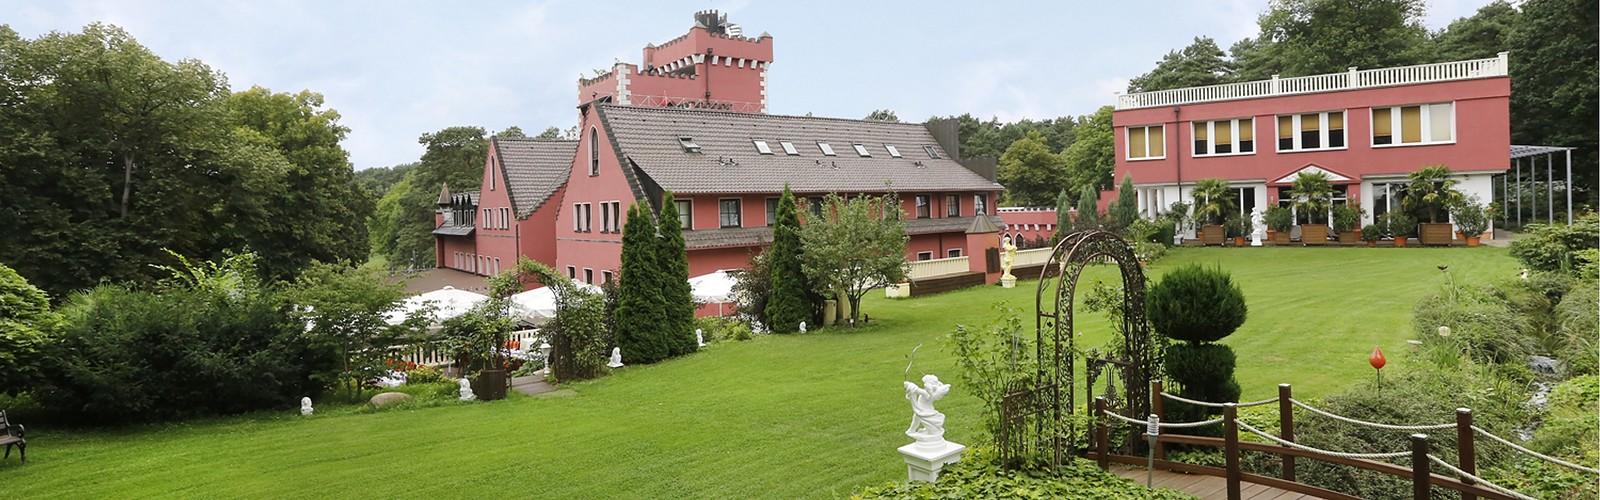 poto: The Lakeside zu Strausberg